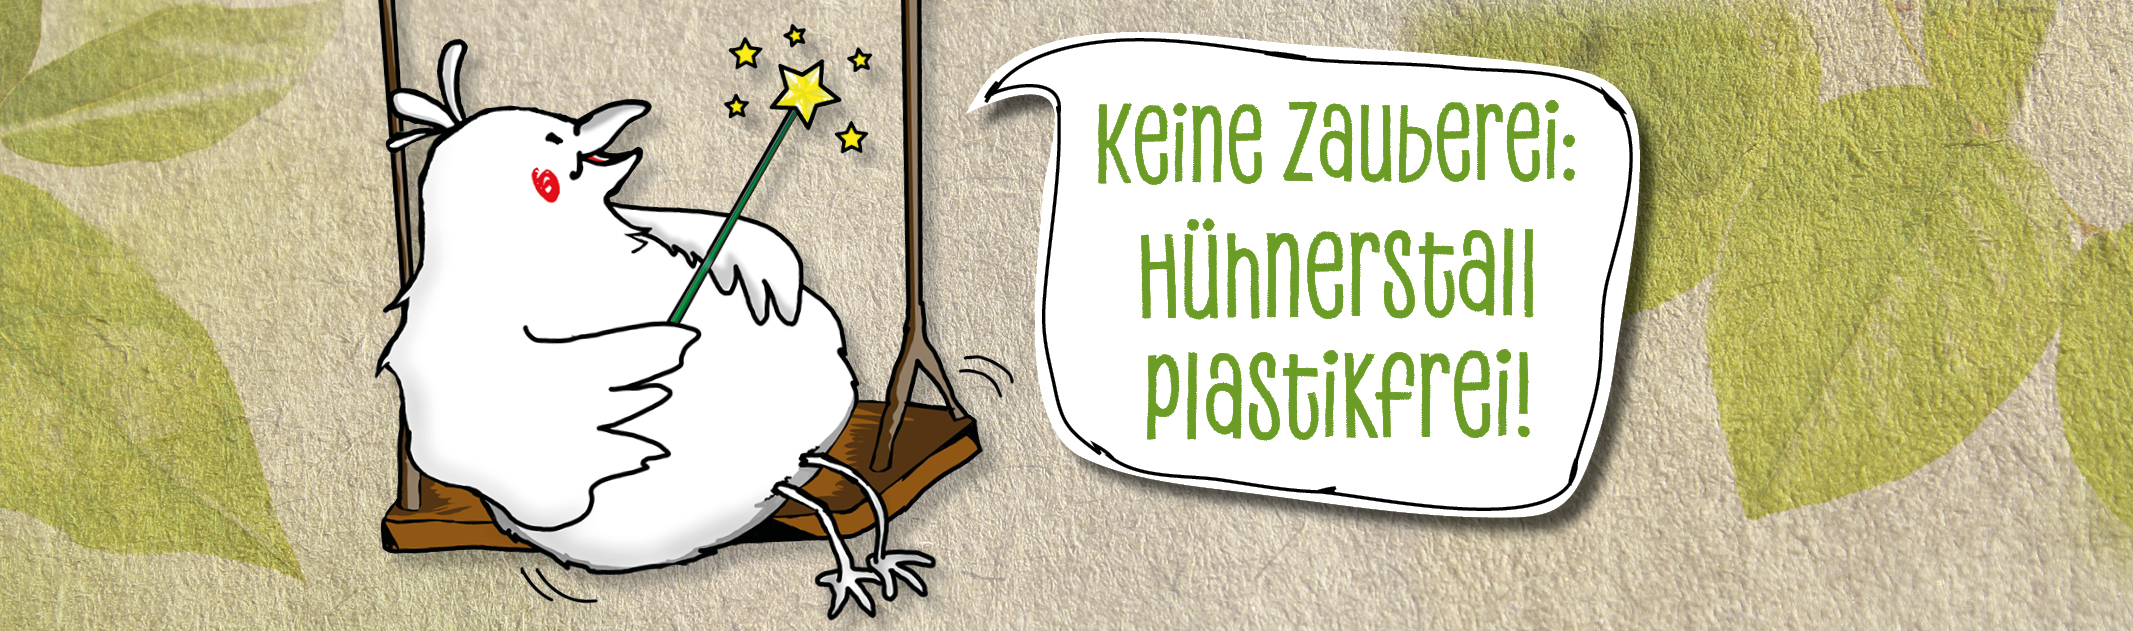 Keine Zauberei: Hühnerstall plastikfrei!